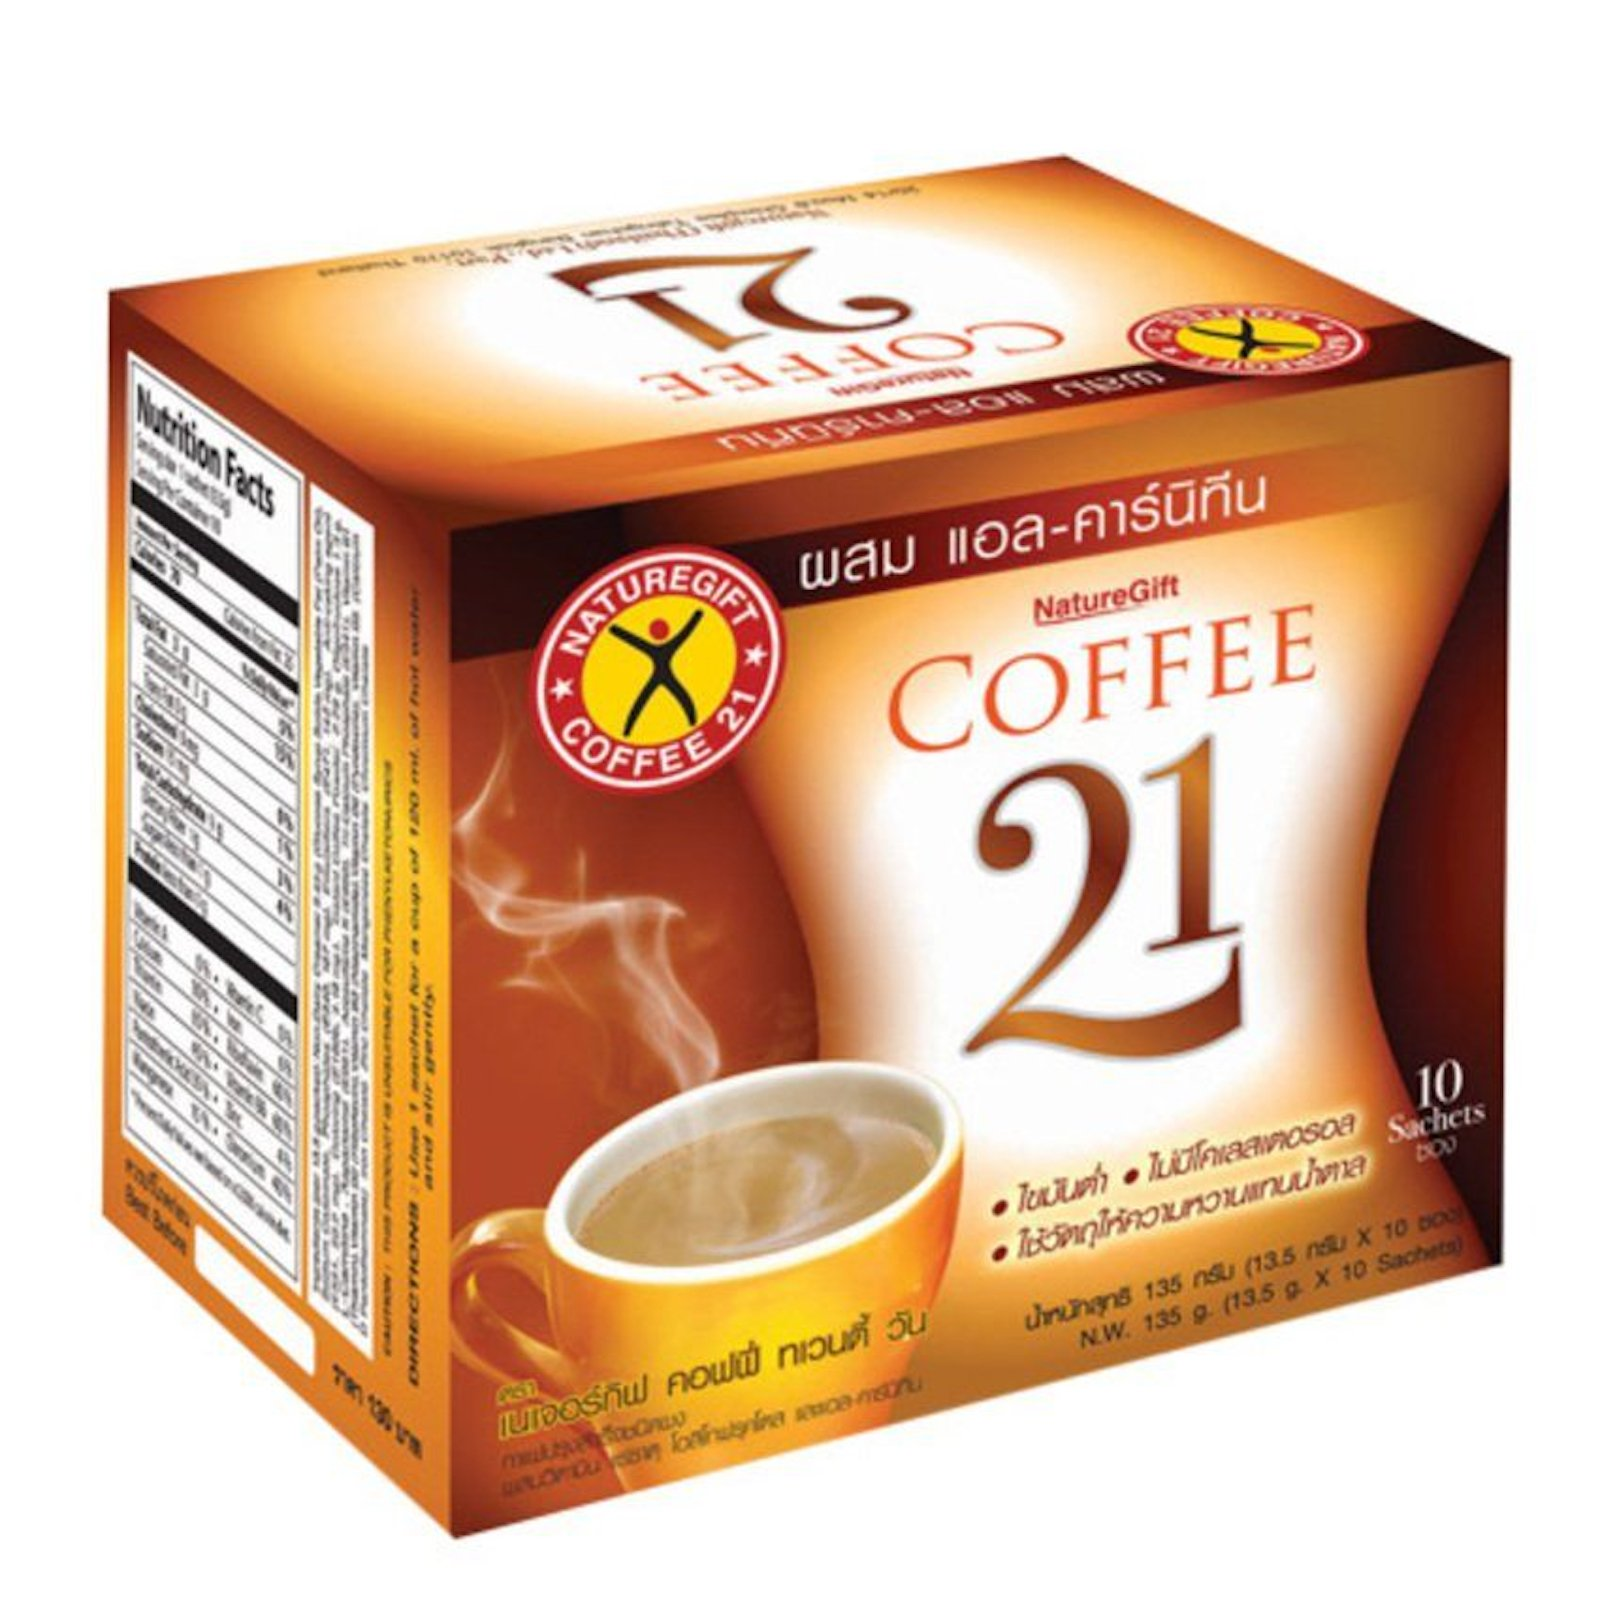 Amazon.com : (10 sachets) Nescafe Protect Proslim Diet Slim Instant Coffee Mix : Grocery